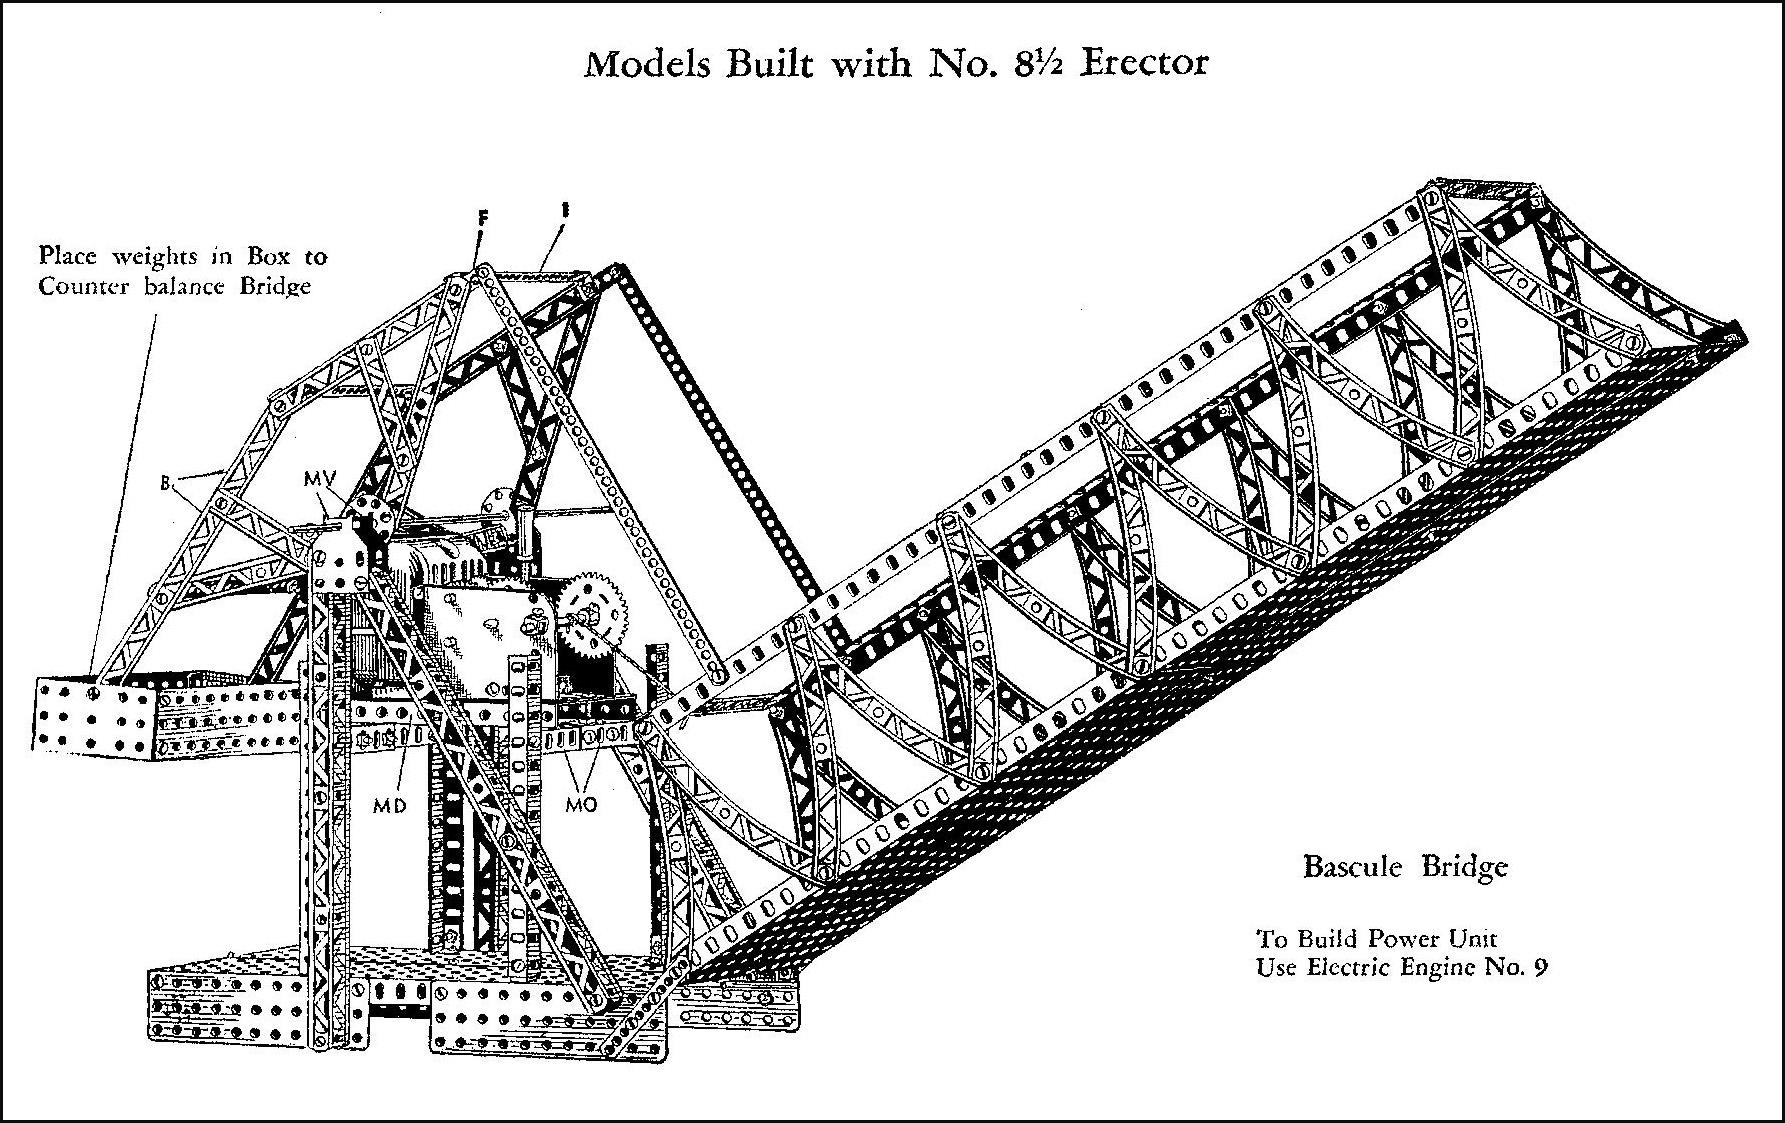 Bascule Bridge Drawing